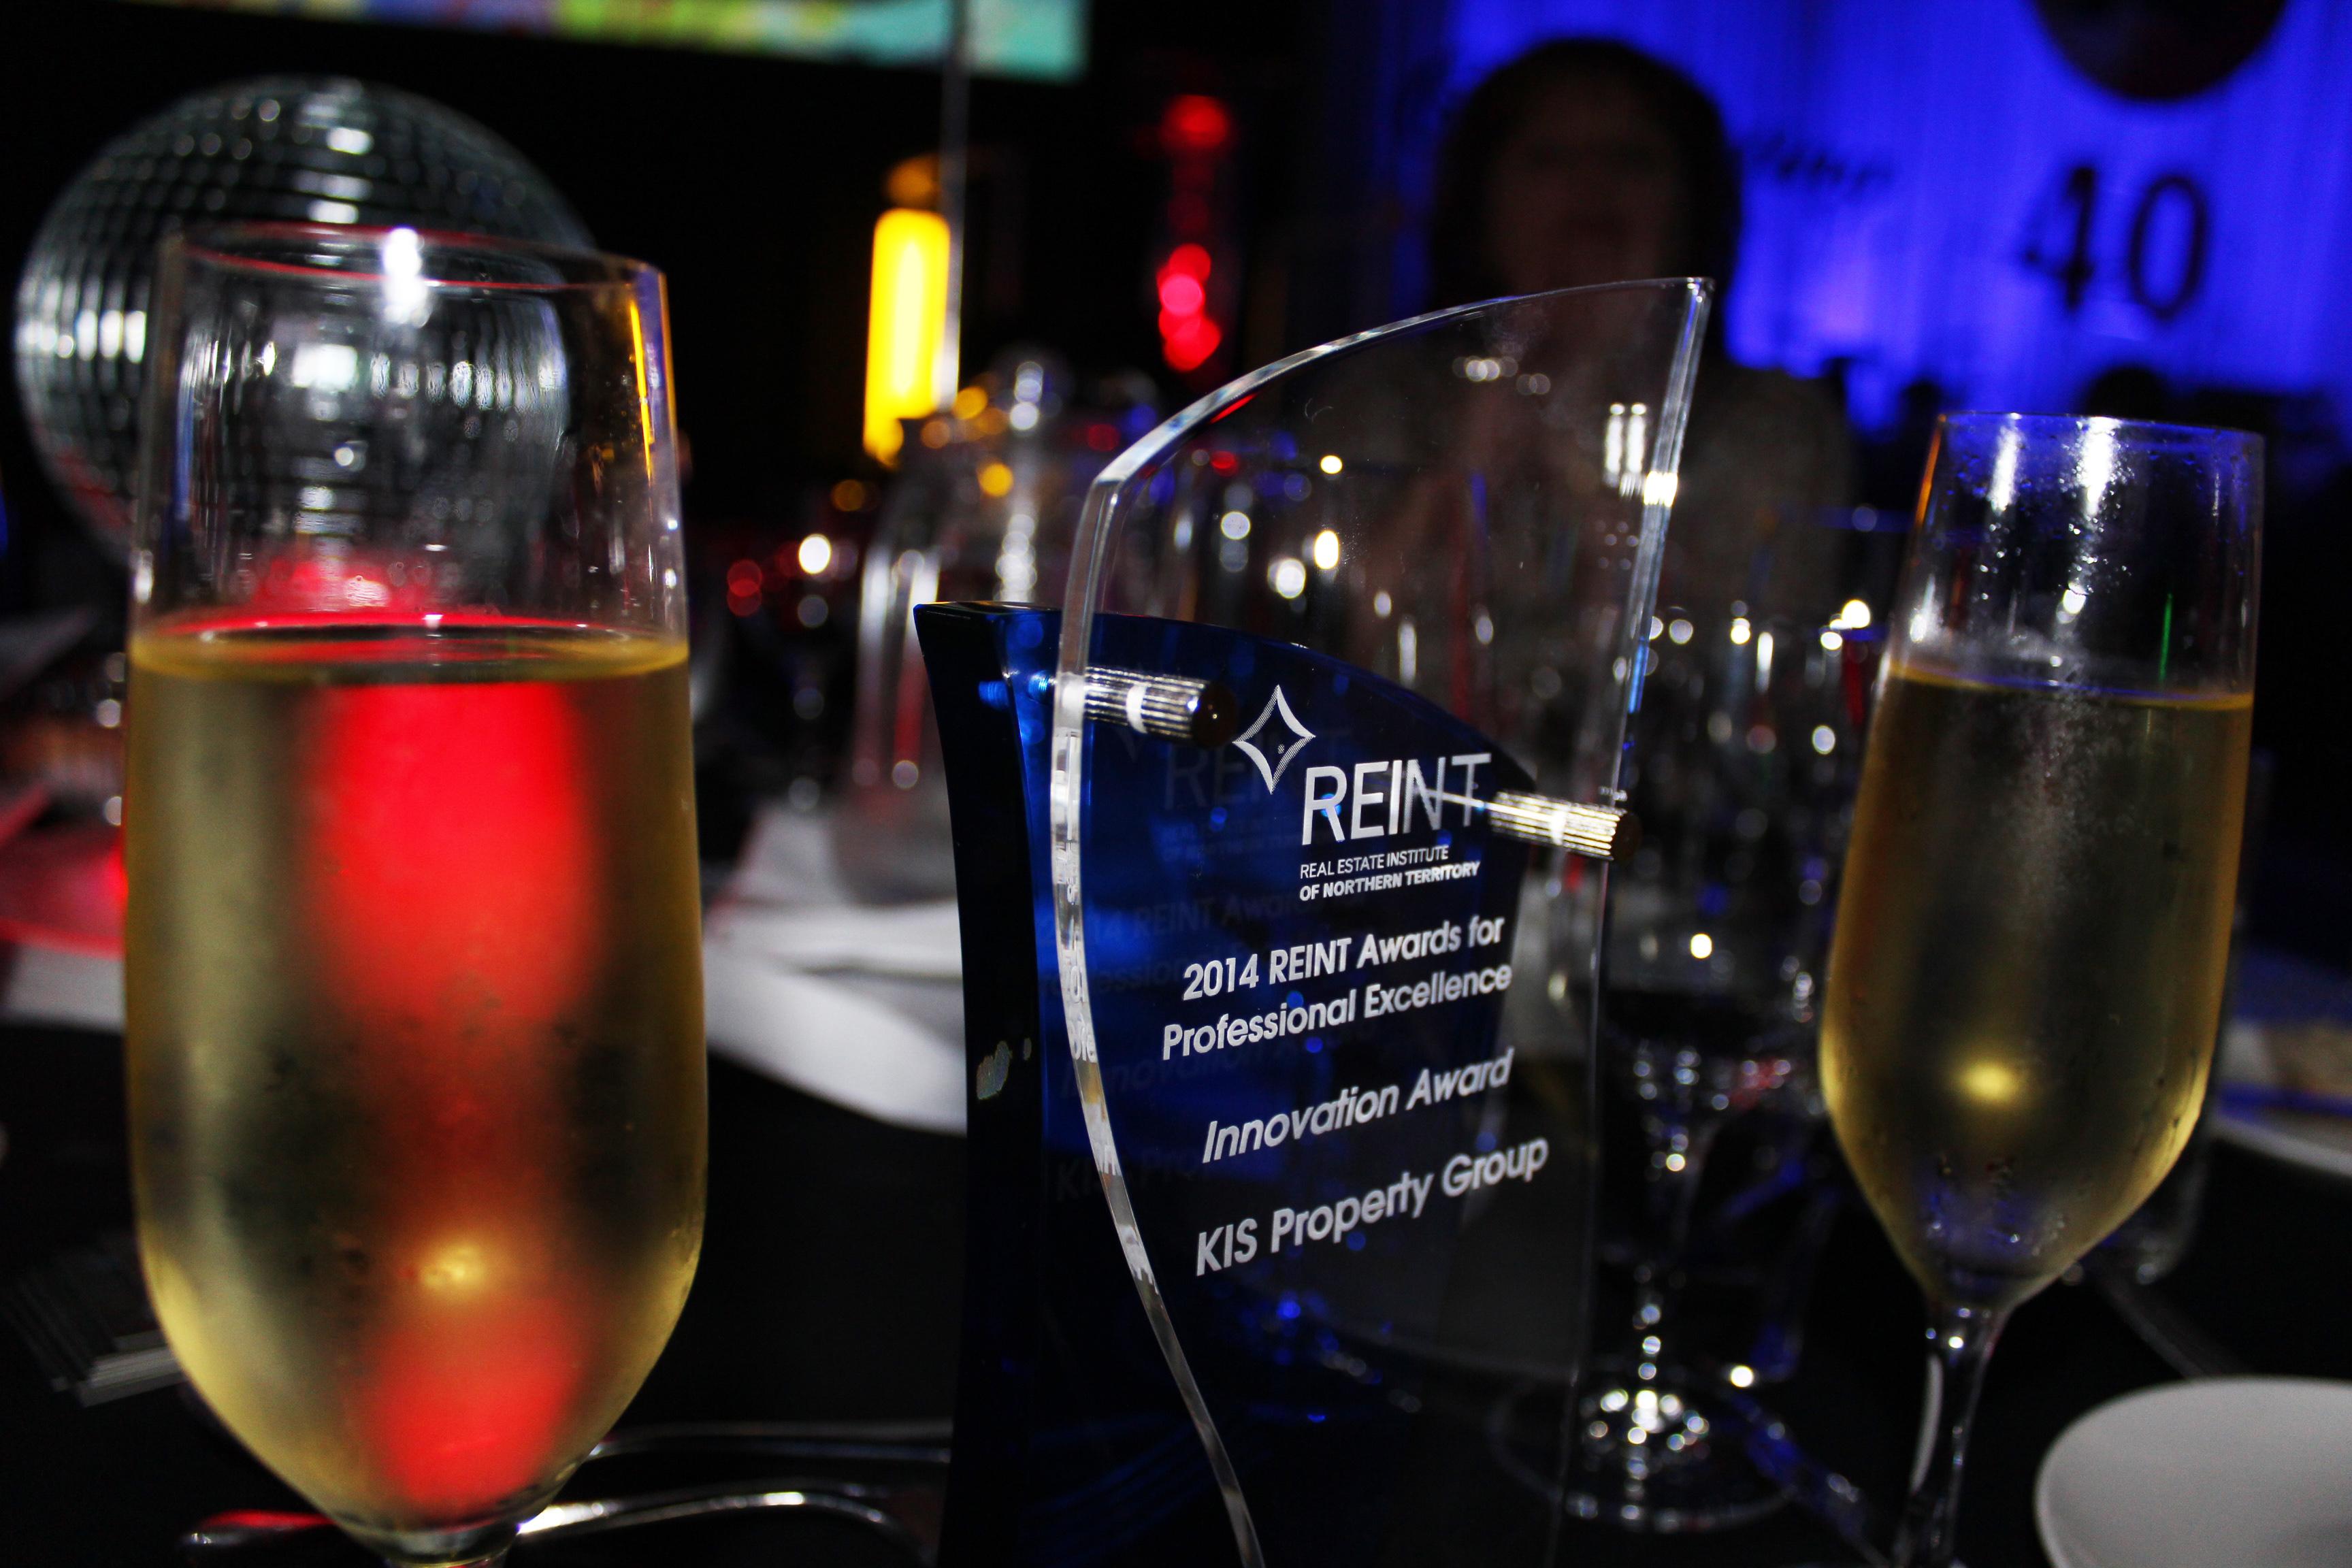 Kis2014 Award